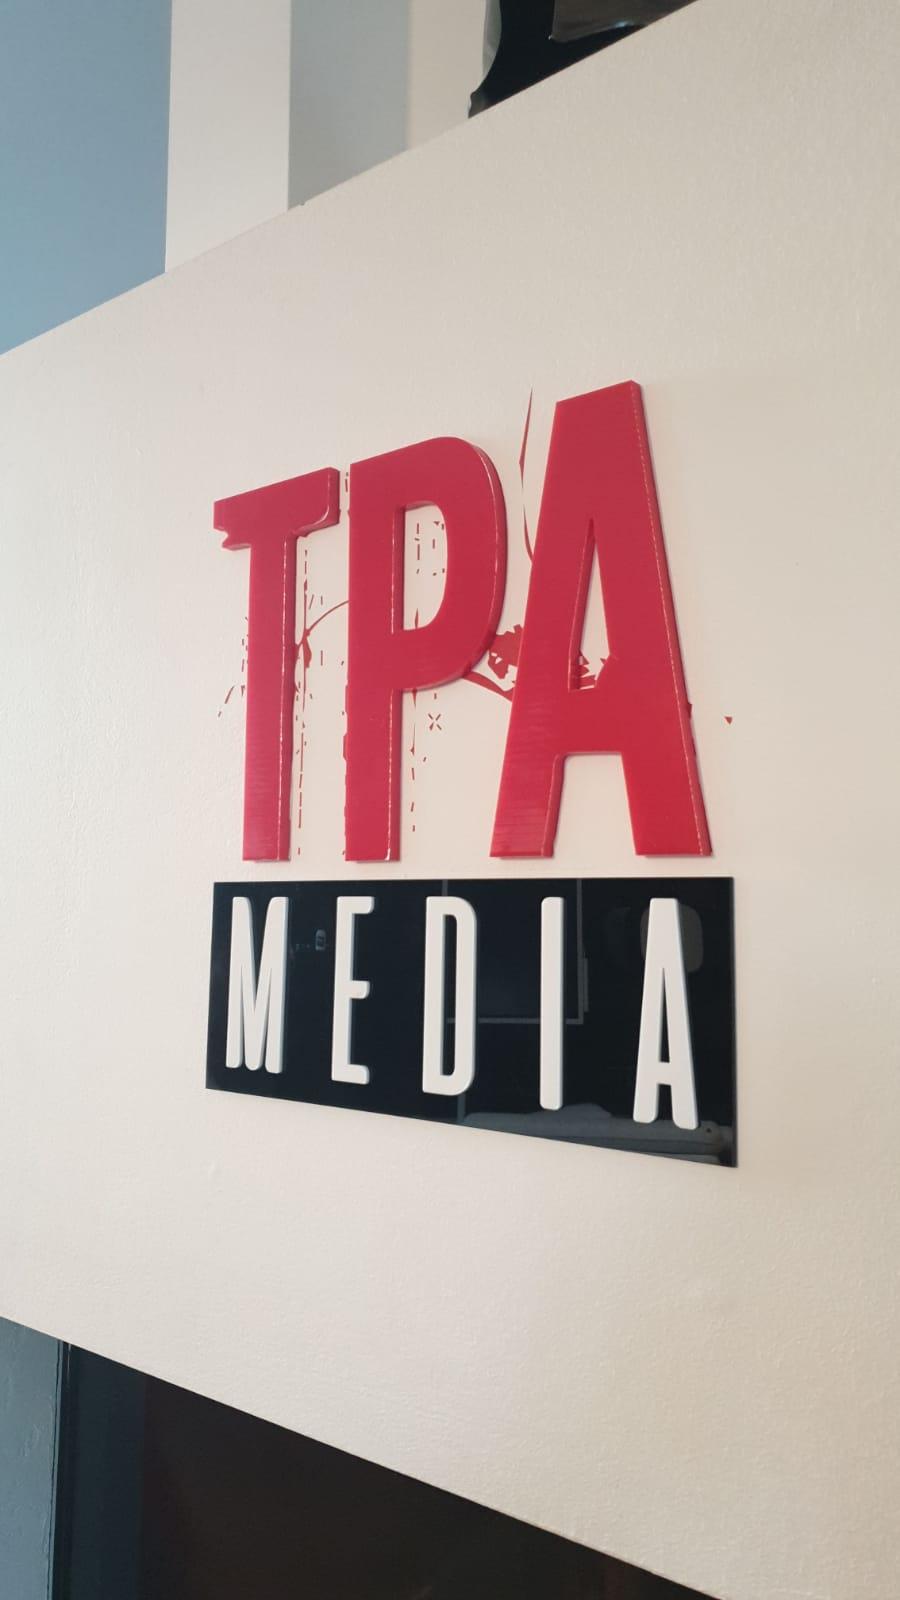 TPA Media